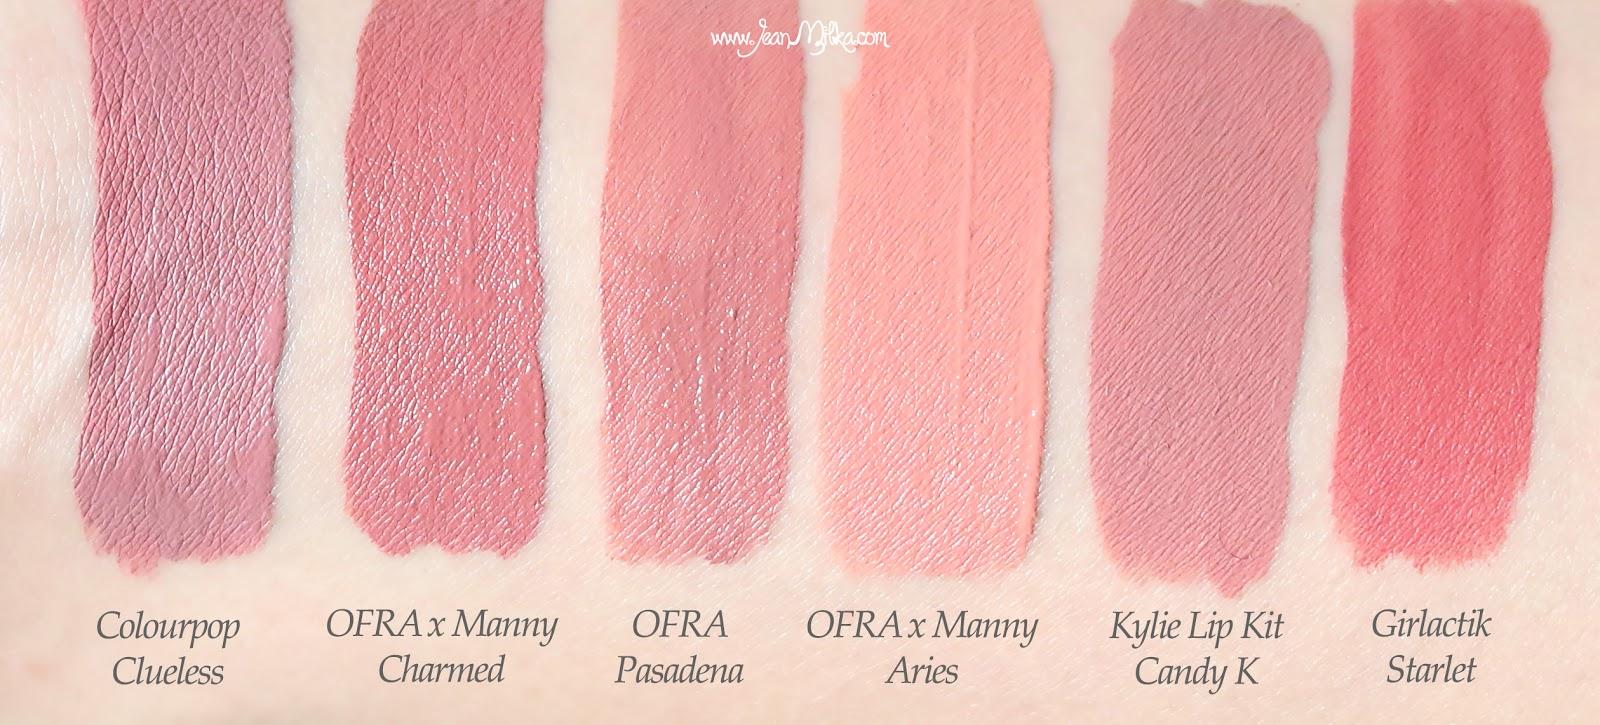 ofra x manny, ofraxmanny, ofra manny, ofra x manny mua, ofra, ofra cosmetics, ofra liquid lipstick, liquid lipstick, product review, swatches, beauty blog, colorpop, kylie lip kit, girlactik